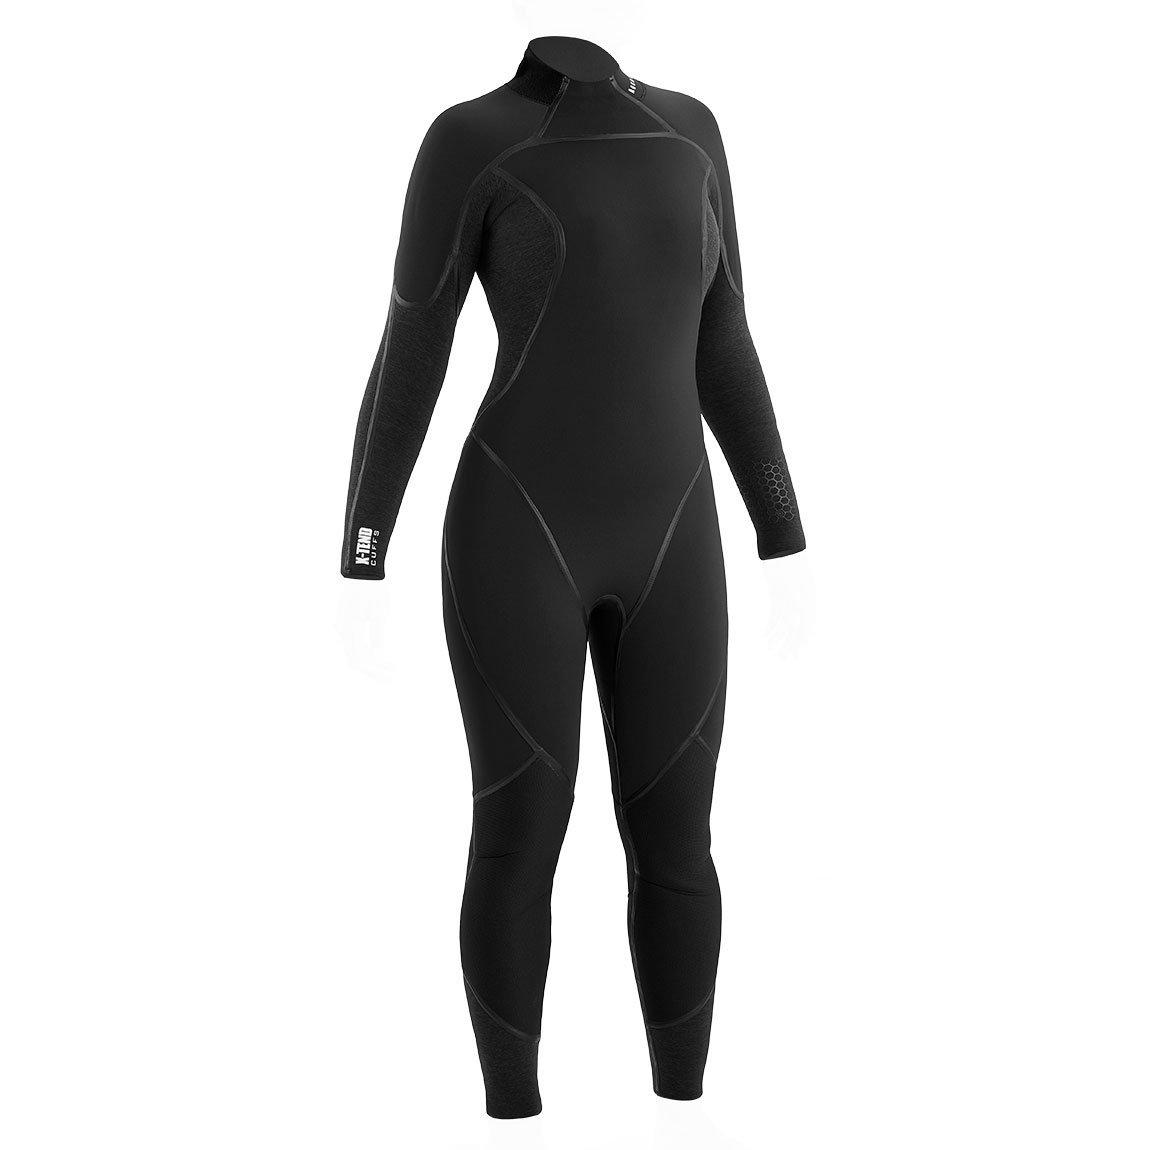 Wetsuit 7mm Aquaflex Women's Black/Charcoal